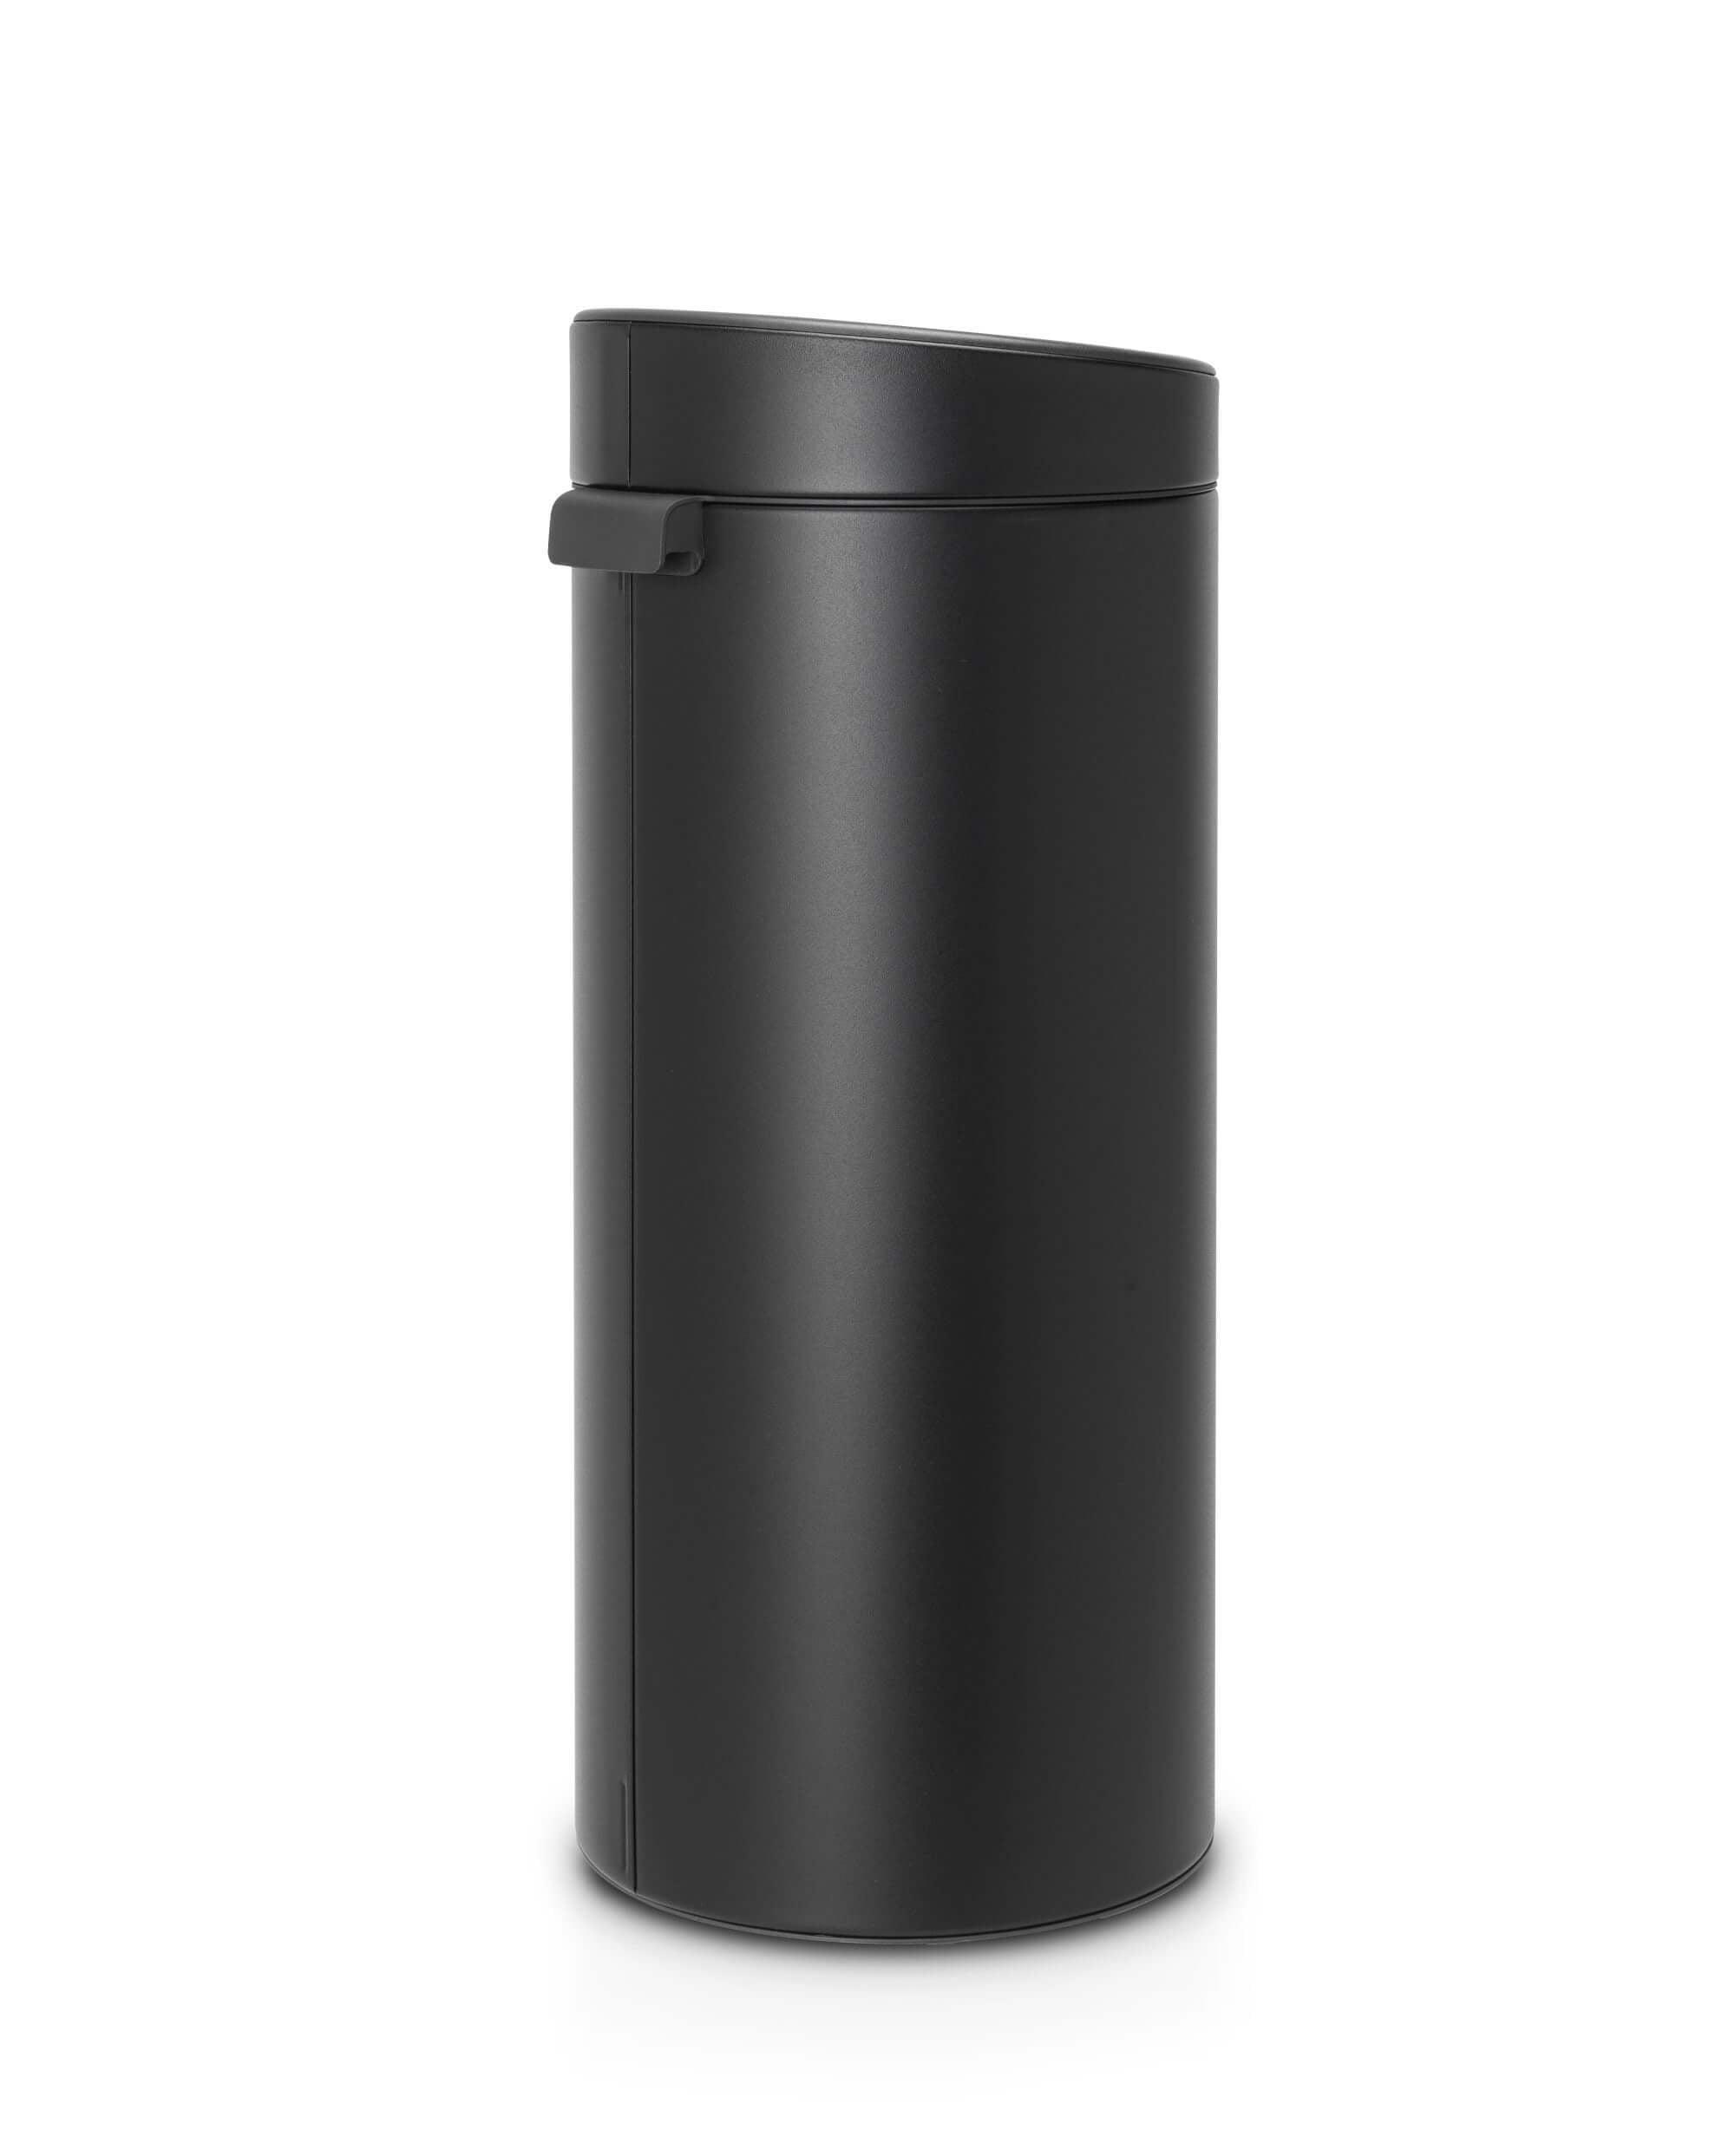 Brabantia 30 Liter Touch Bin.Brabantia Touch Bin 30 Liter Mineral Moonlight Black Brabantia Touch Bin 30 Liter Mineral Moonlight Black